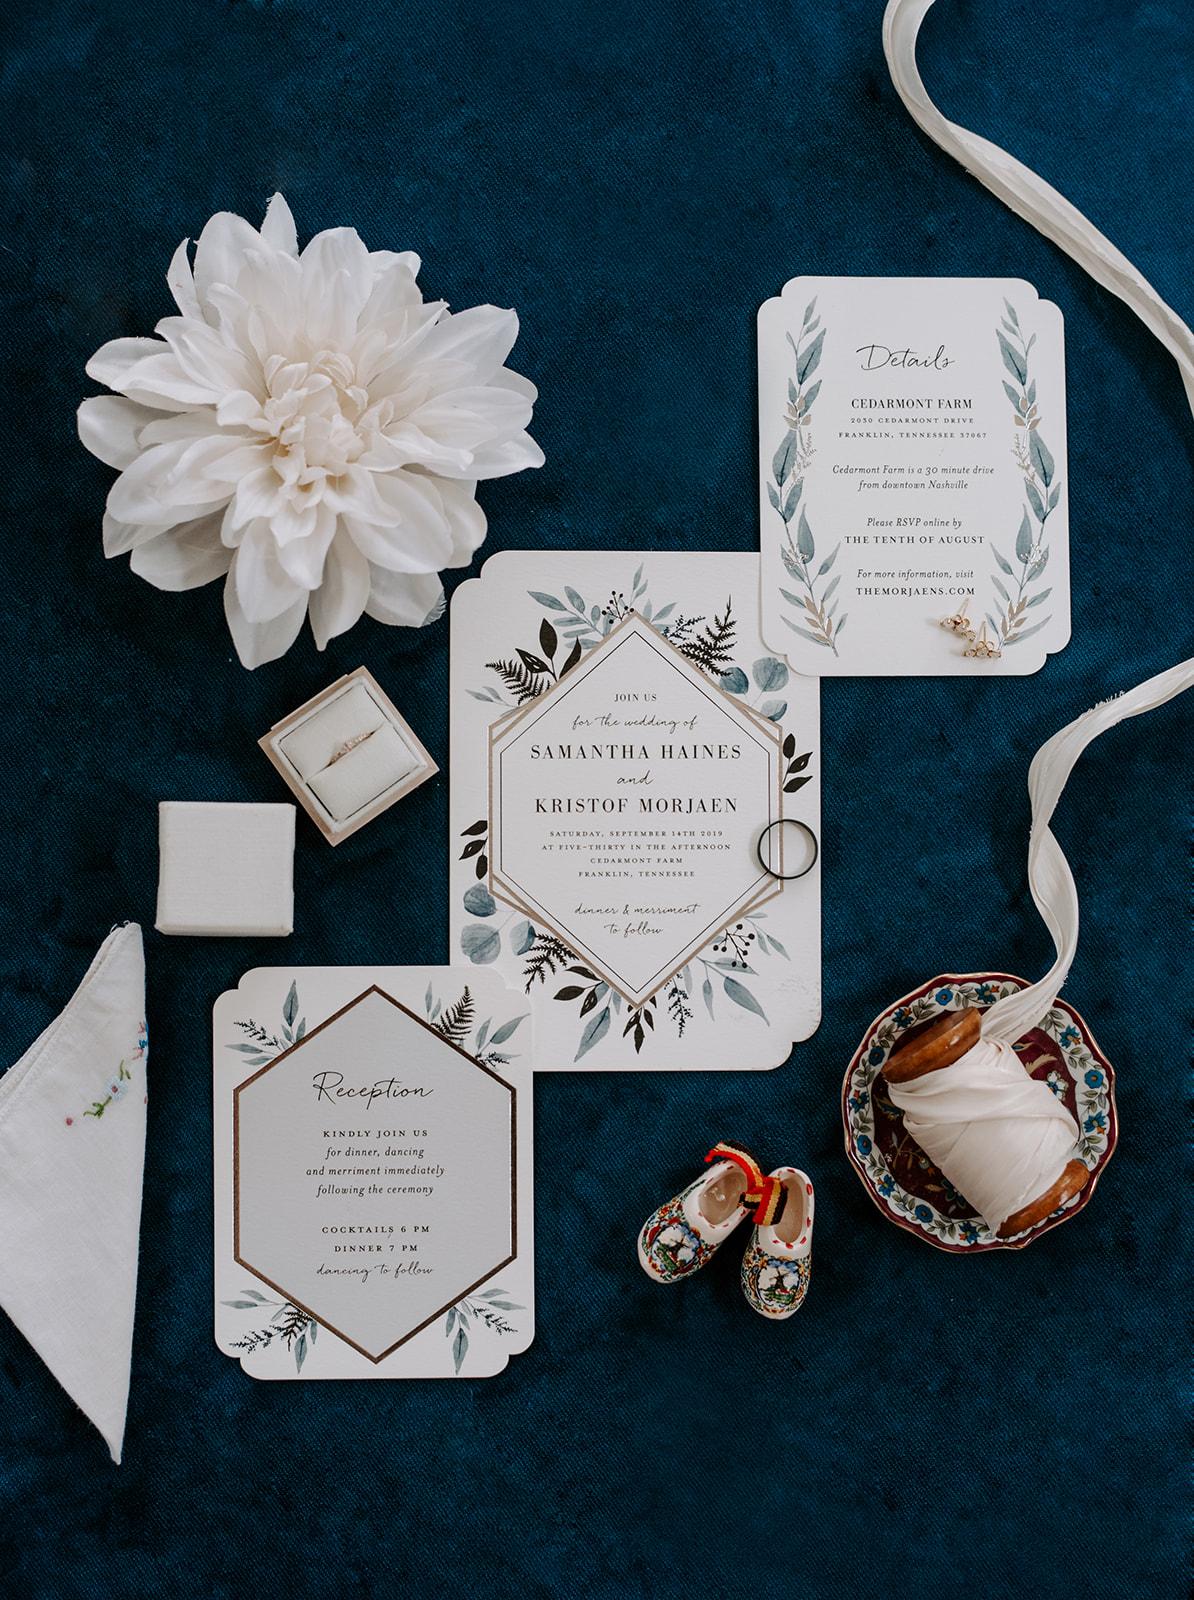 Blue and greenery wedding invitation design for Nashville wedding